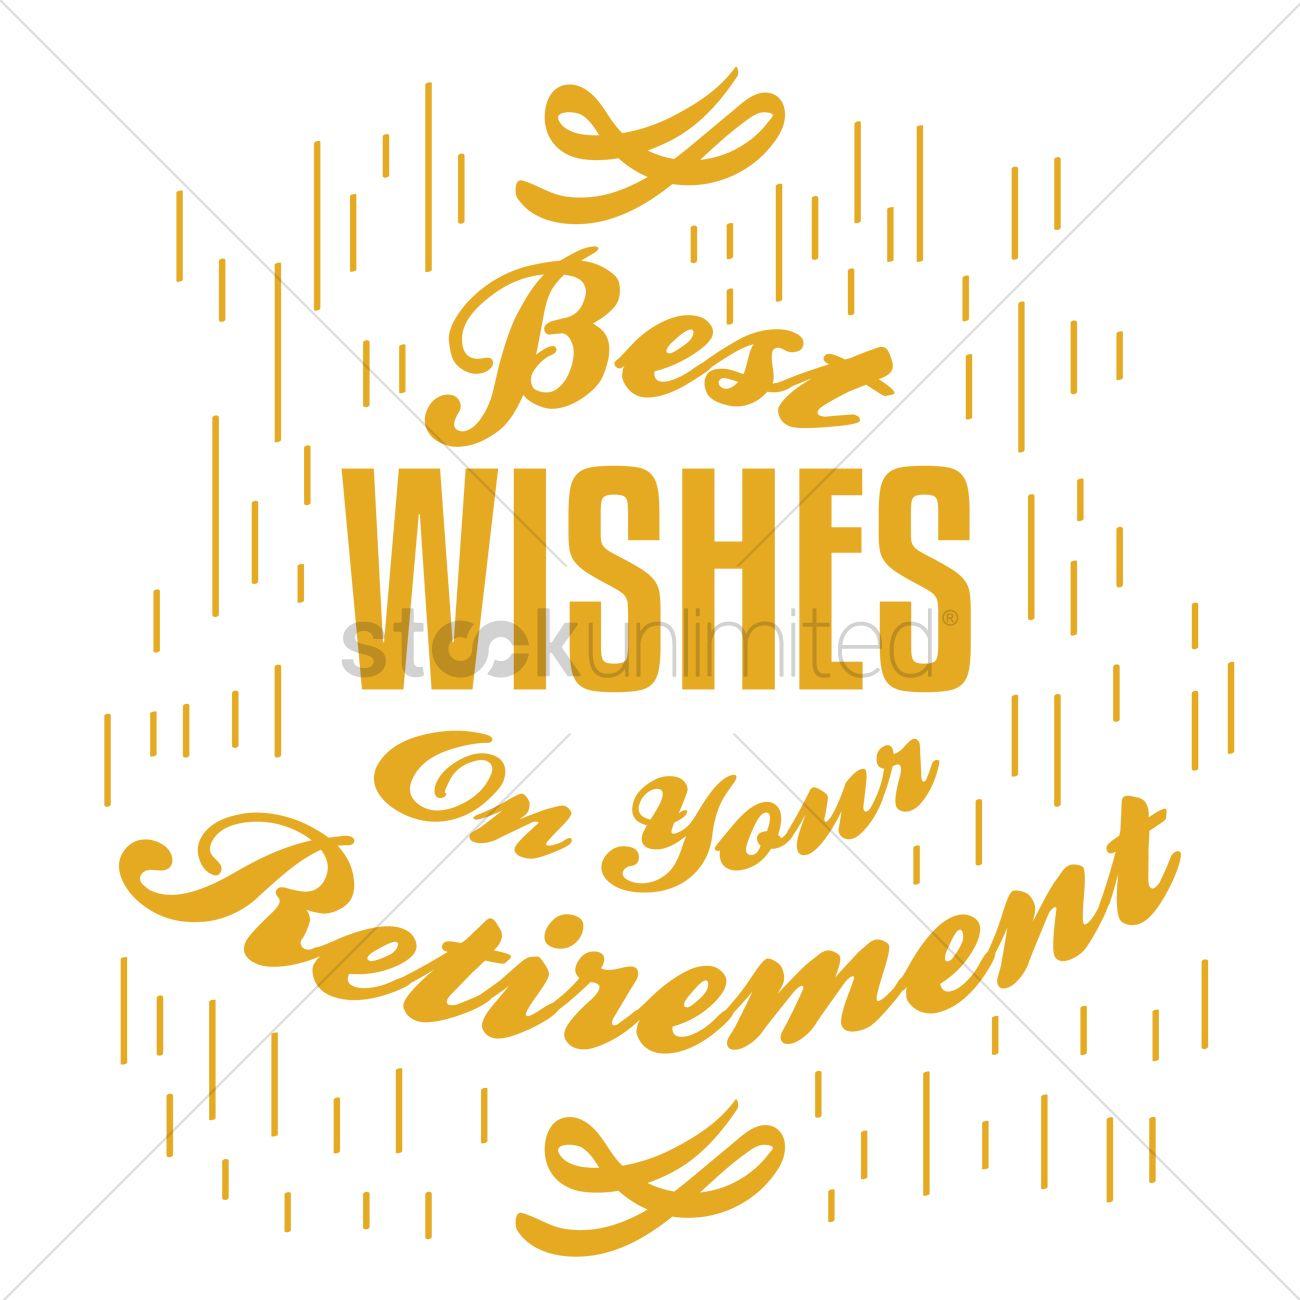 Happy retirement wish vector image 1827718 stockunlimited happy retirement wish vector graphic kristyandbryce Images